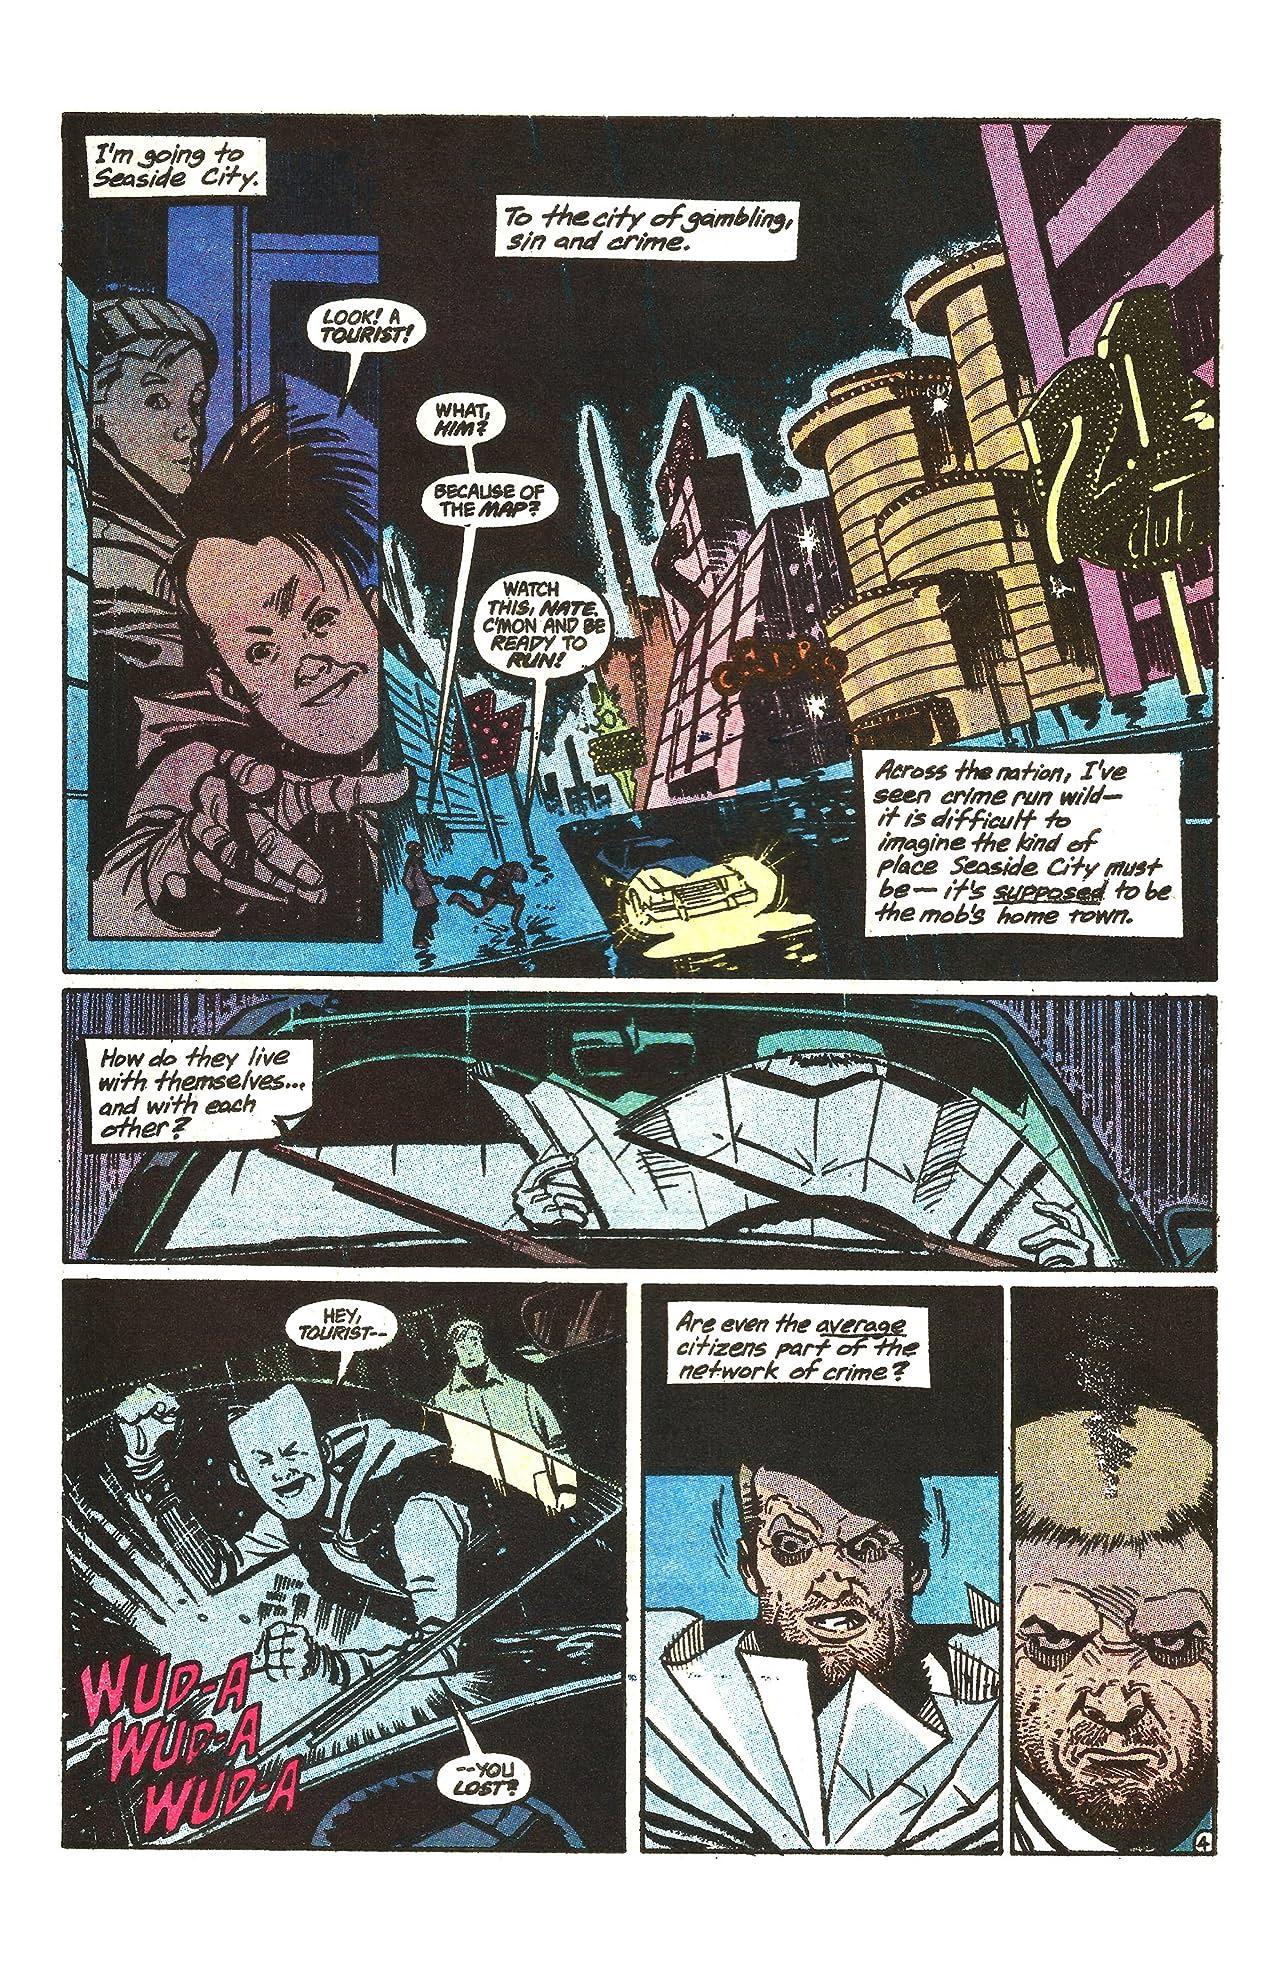 The Black Hood (Impact Comics) #1